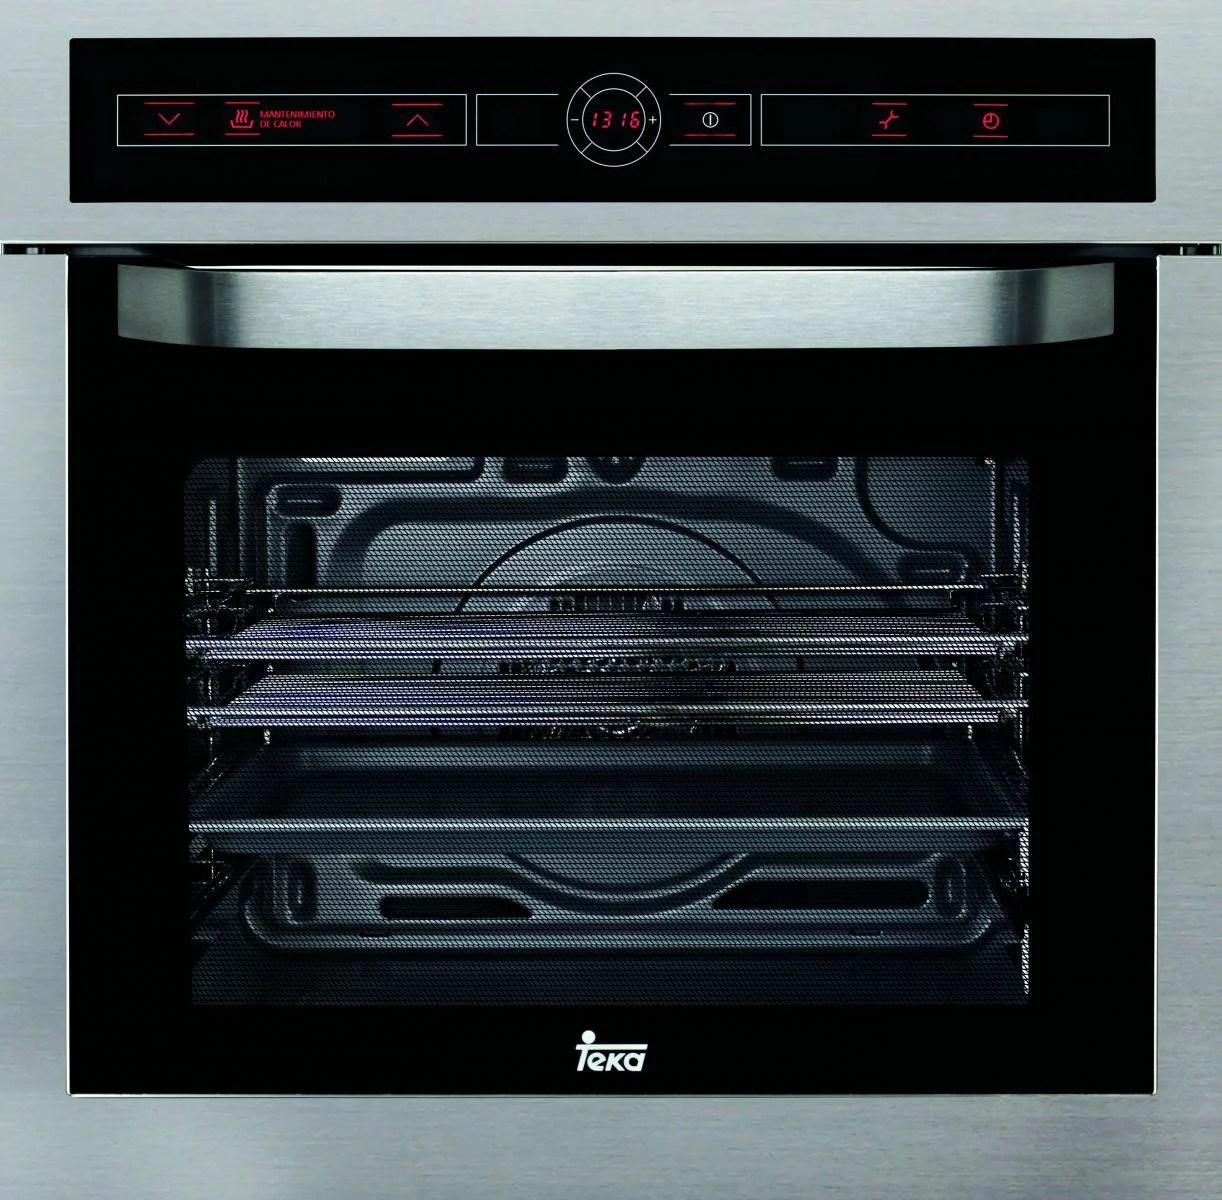 TEKA 德國 HL-890 崁入式60公分不鏽鋼旋風烤箱【零利率】※熱線07-7428010 | 得意專業家電音響 - Rakuten樂天市場